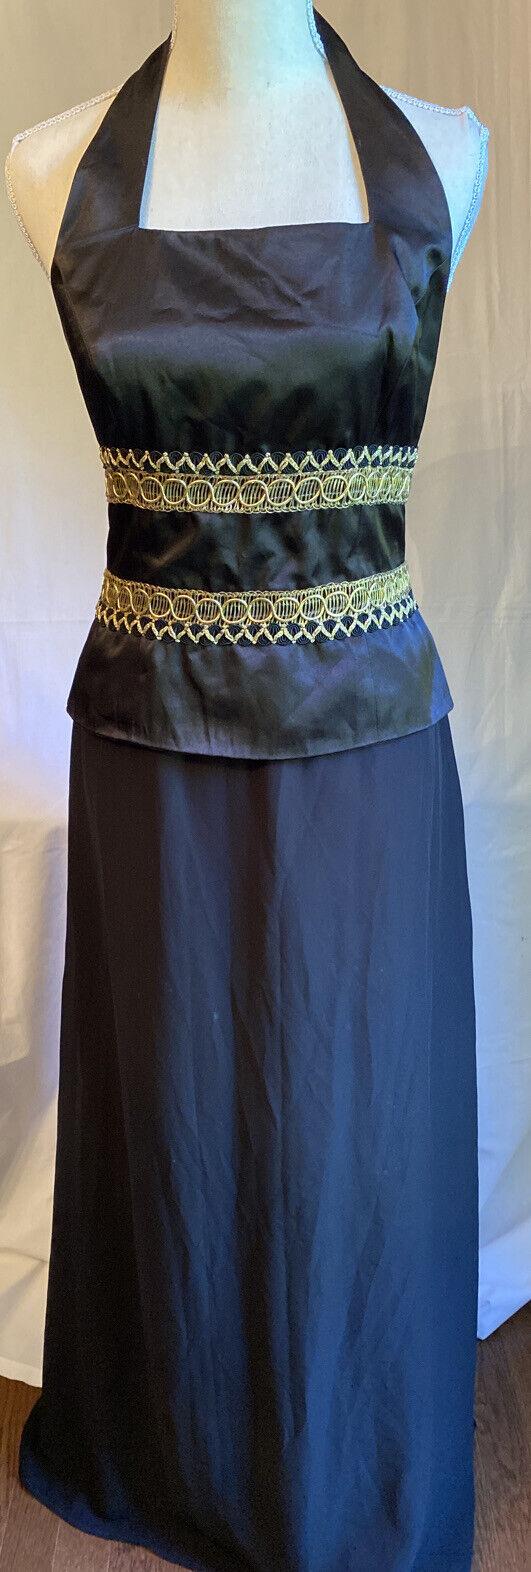 Chadwicks Halter Style Black w/ Gold Trim Evening Gown Formal Prom Size 8 EUC